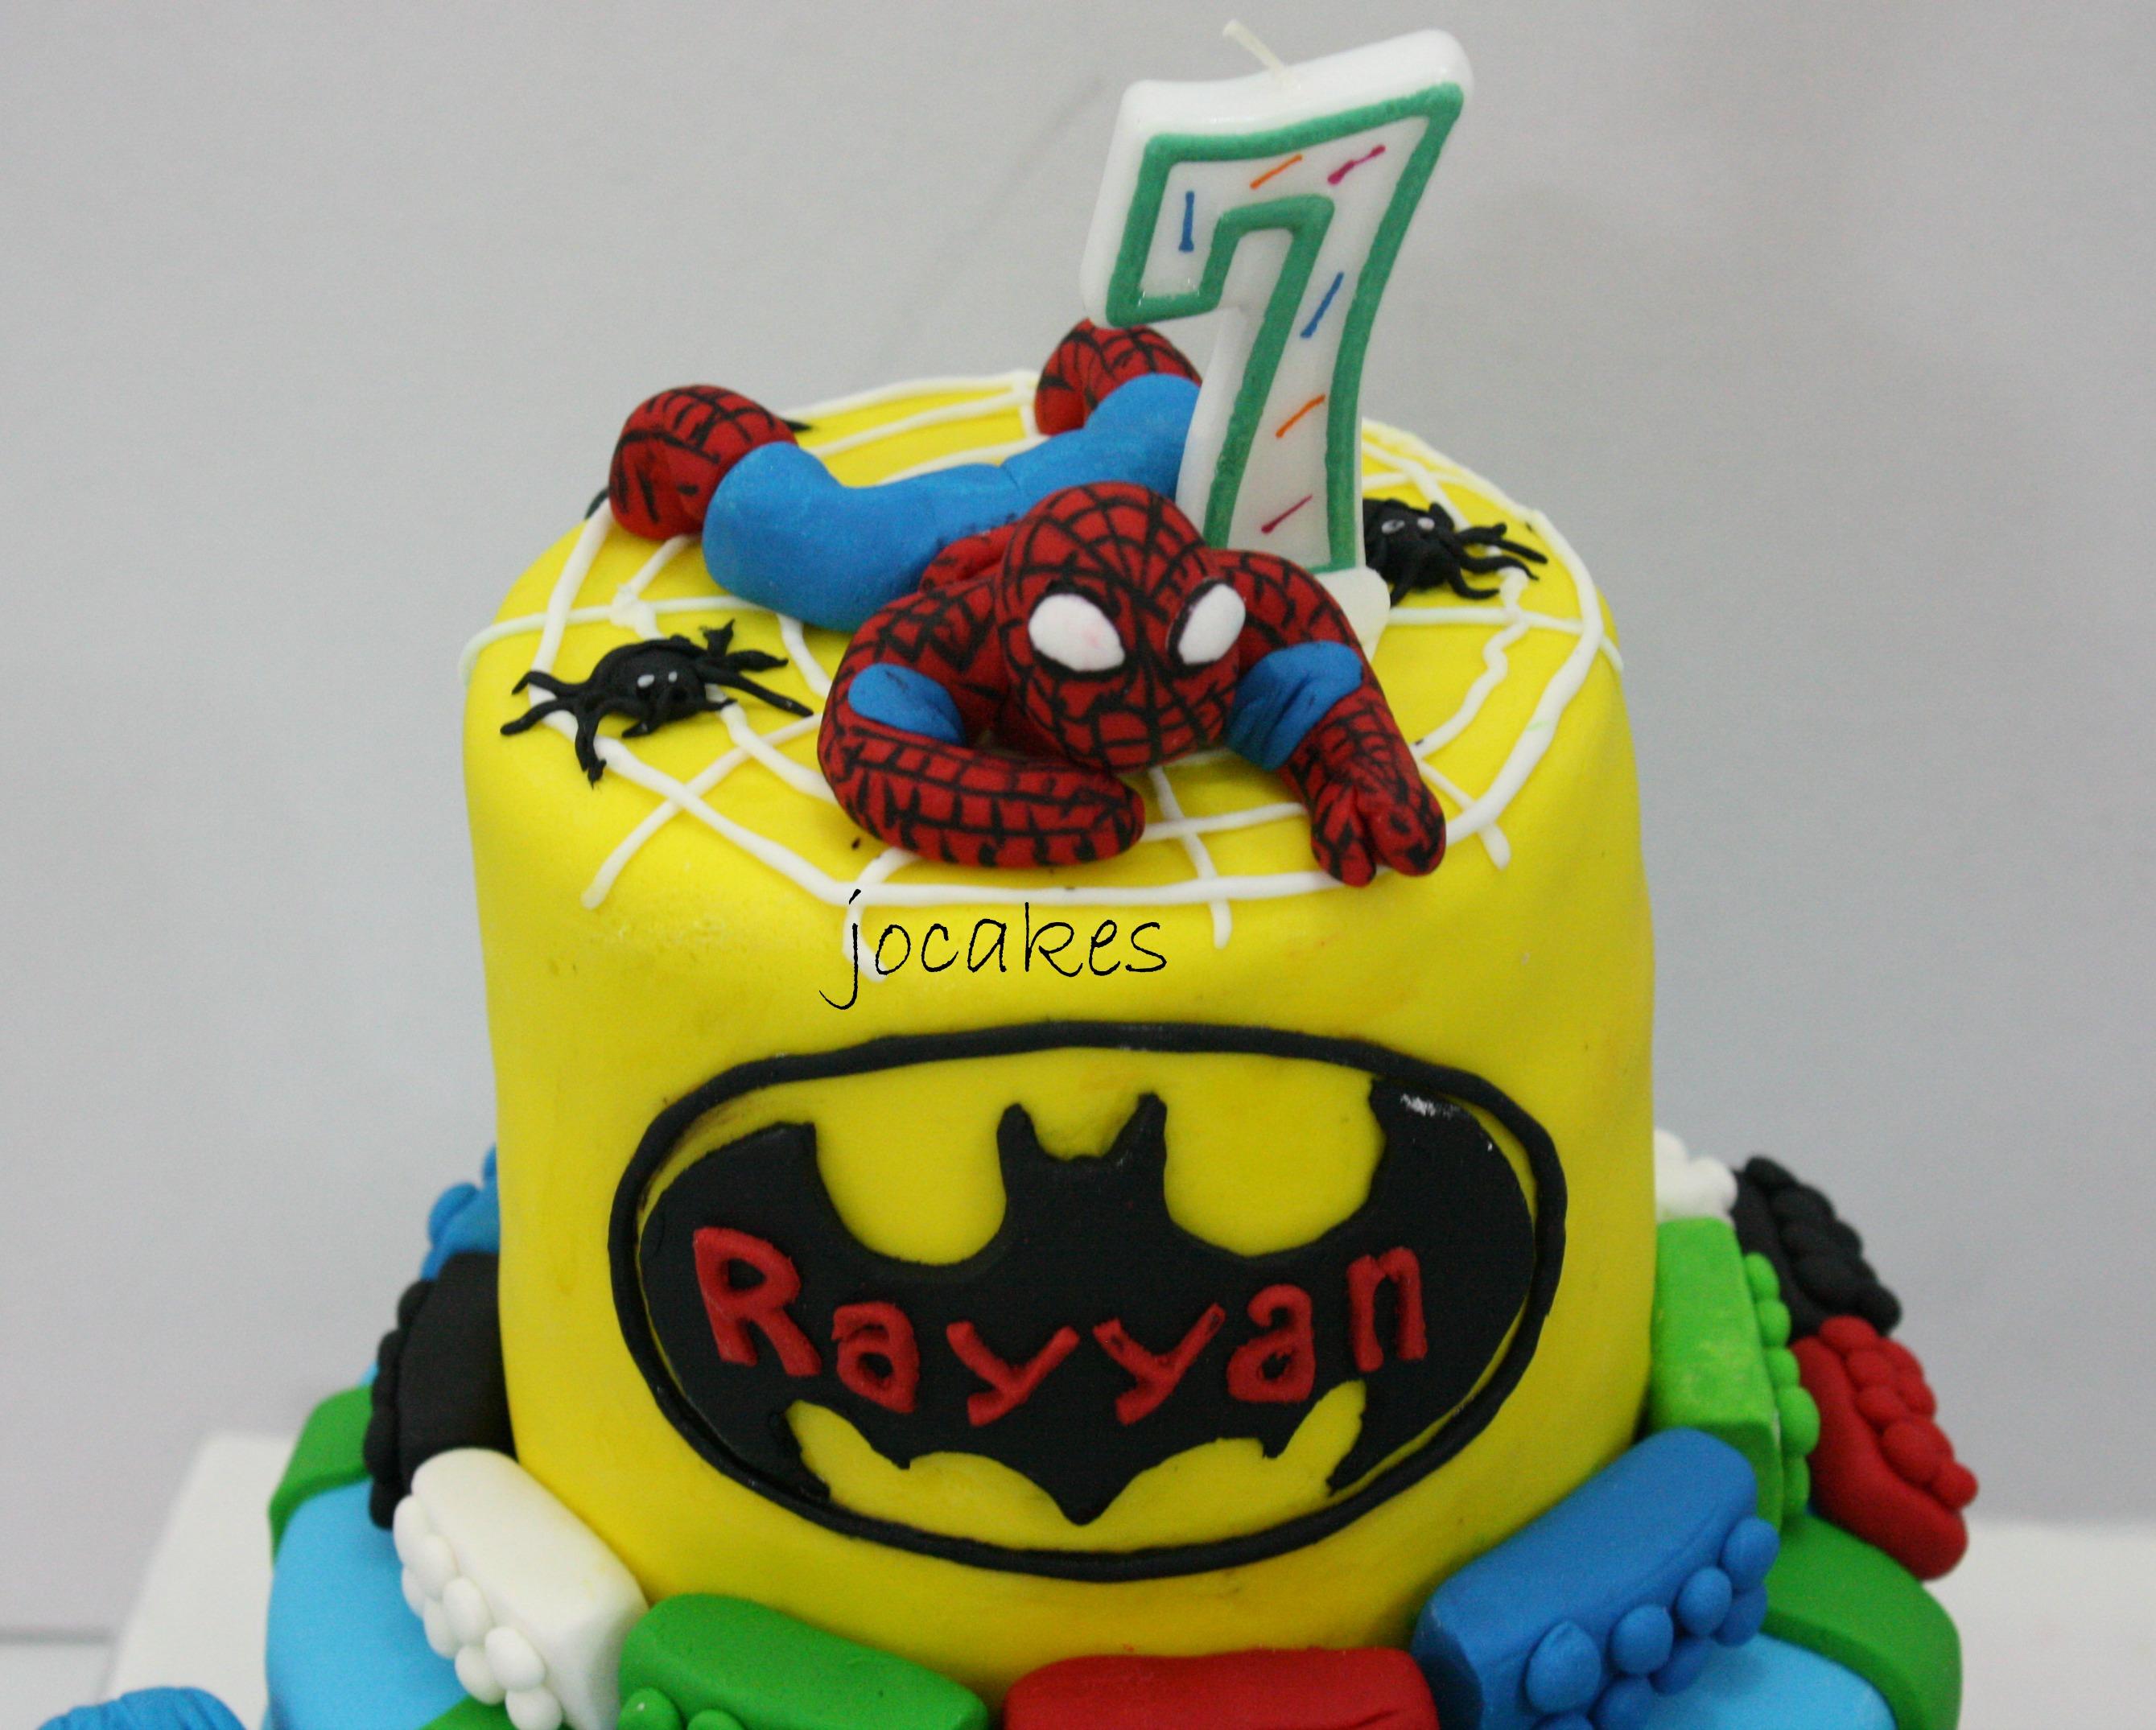 Terrific 6 Lego Ninjago Birthday Cakes For Boys Photo Lego Birthday Cake Funny Birthday Cards Online Hetedamsfinfo